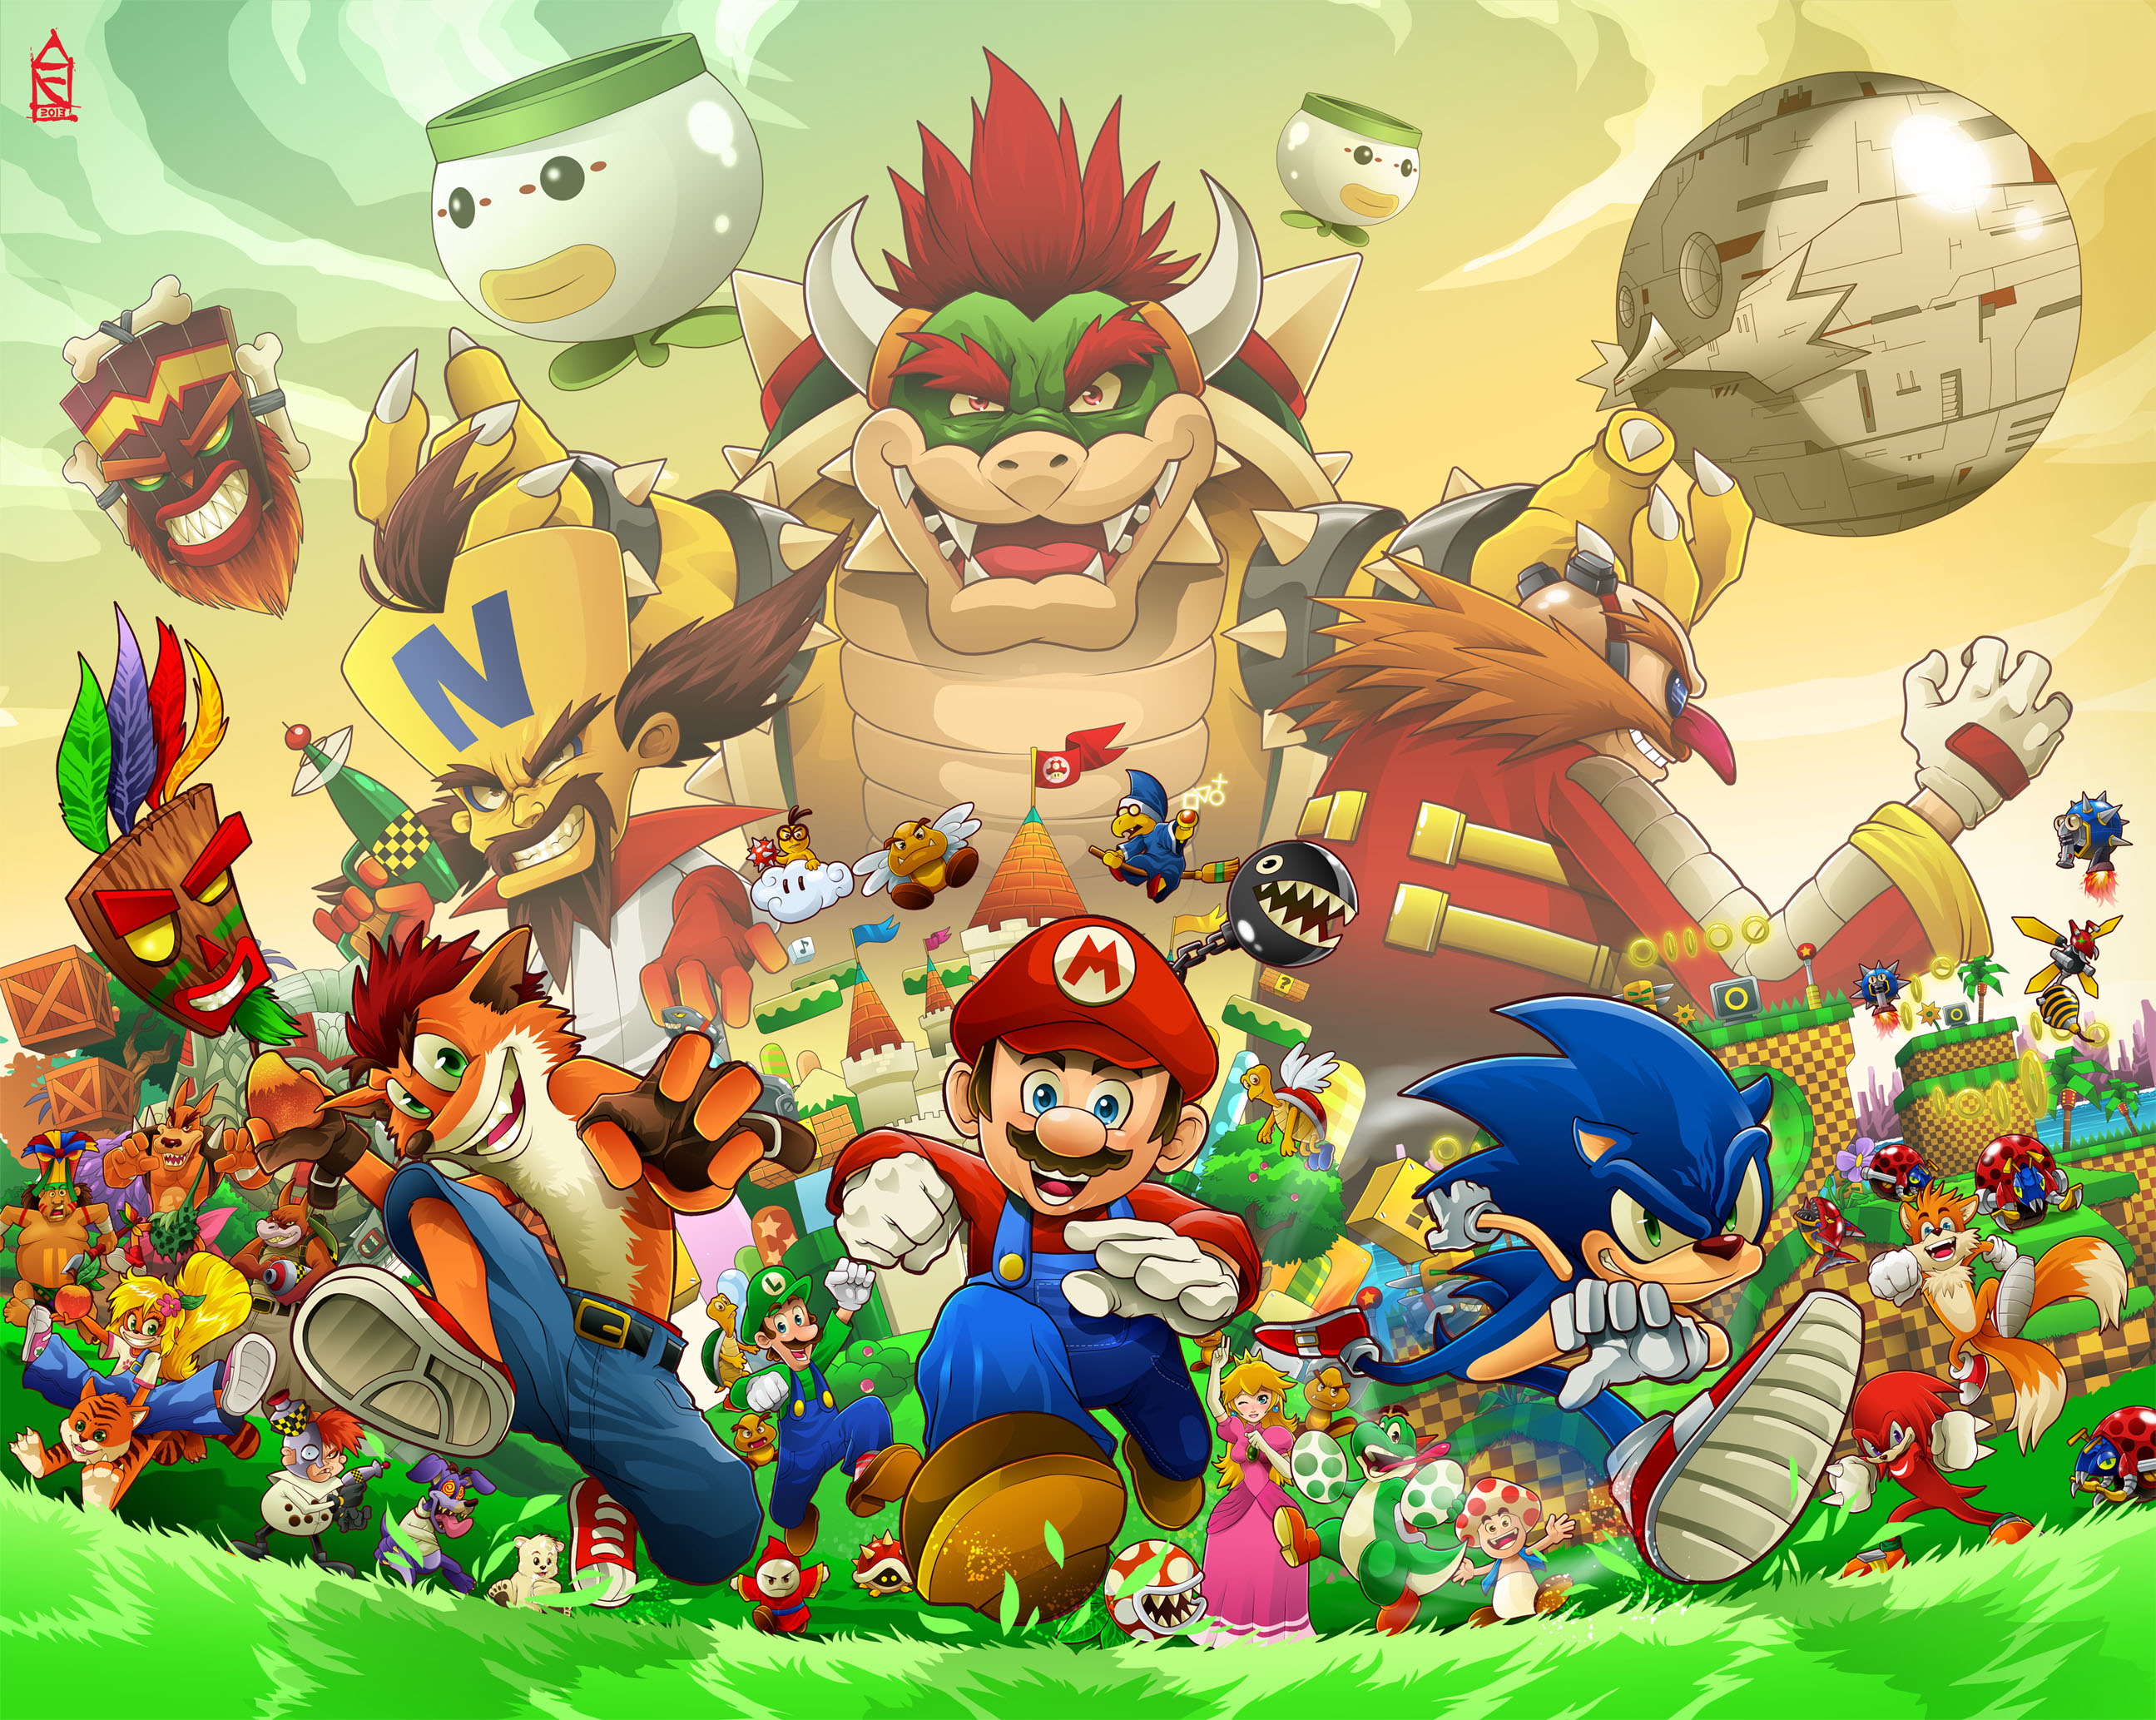 Crash Bandicoot Super Mario Bros And Sonic The Hedgedog Crossover